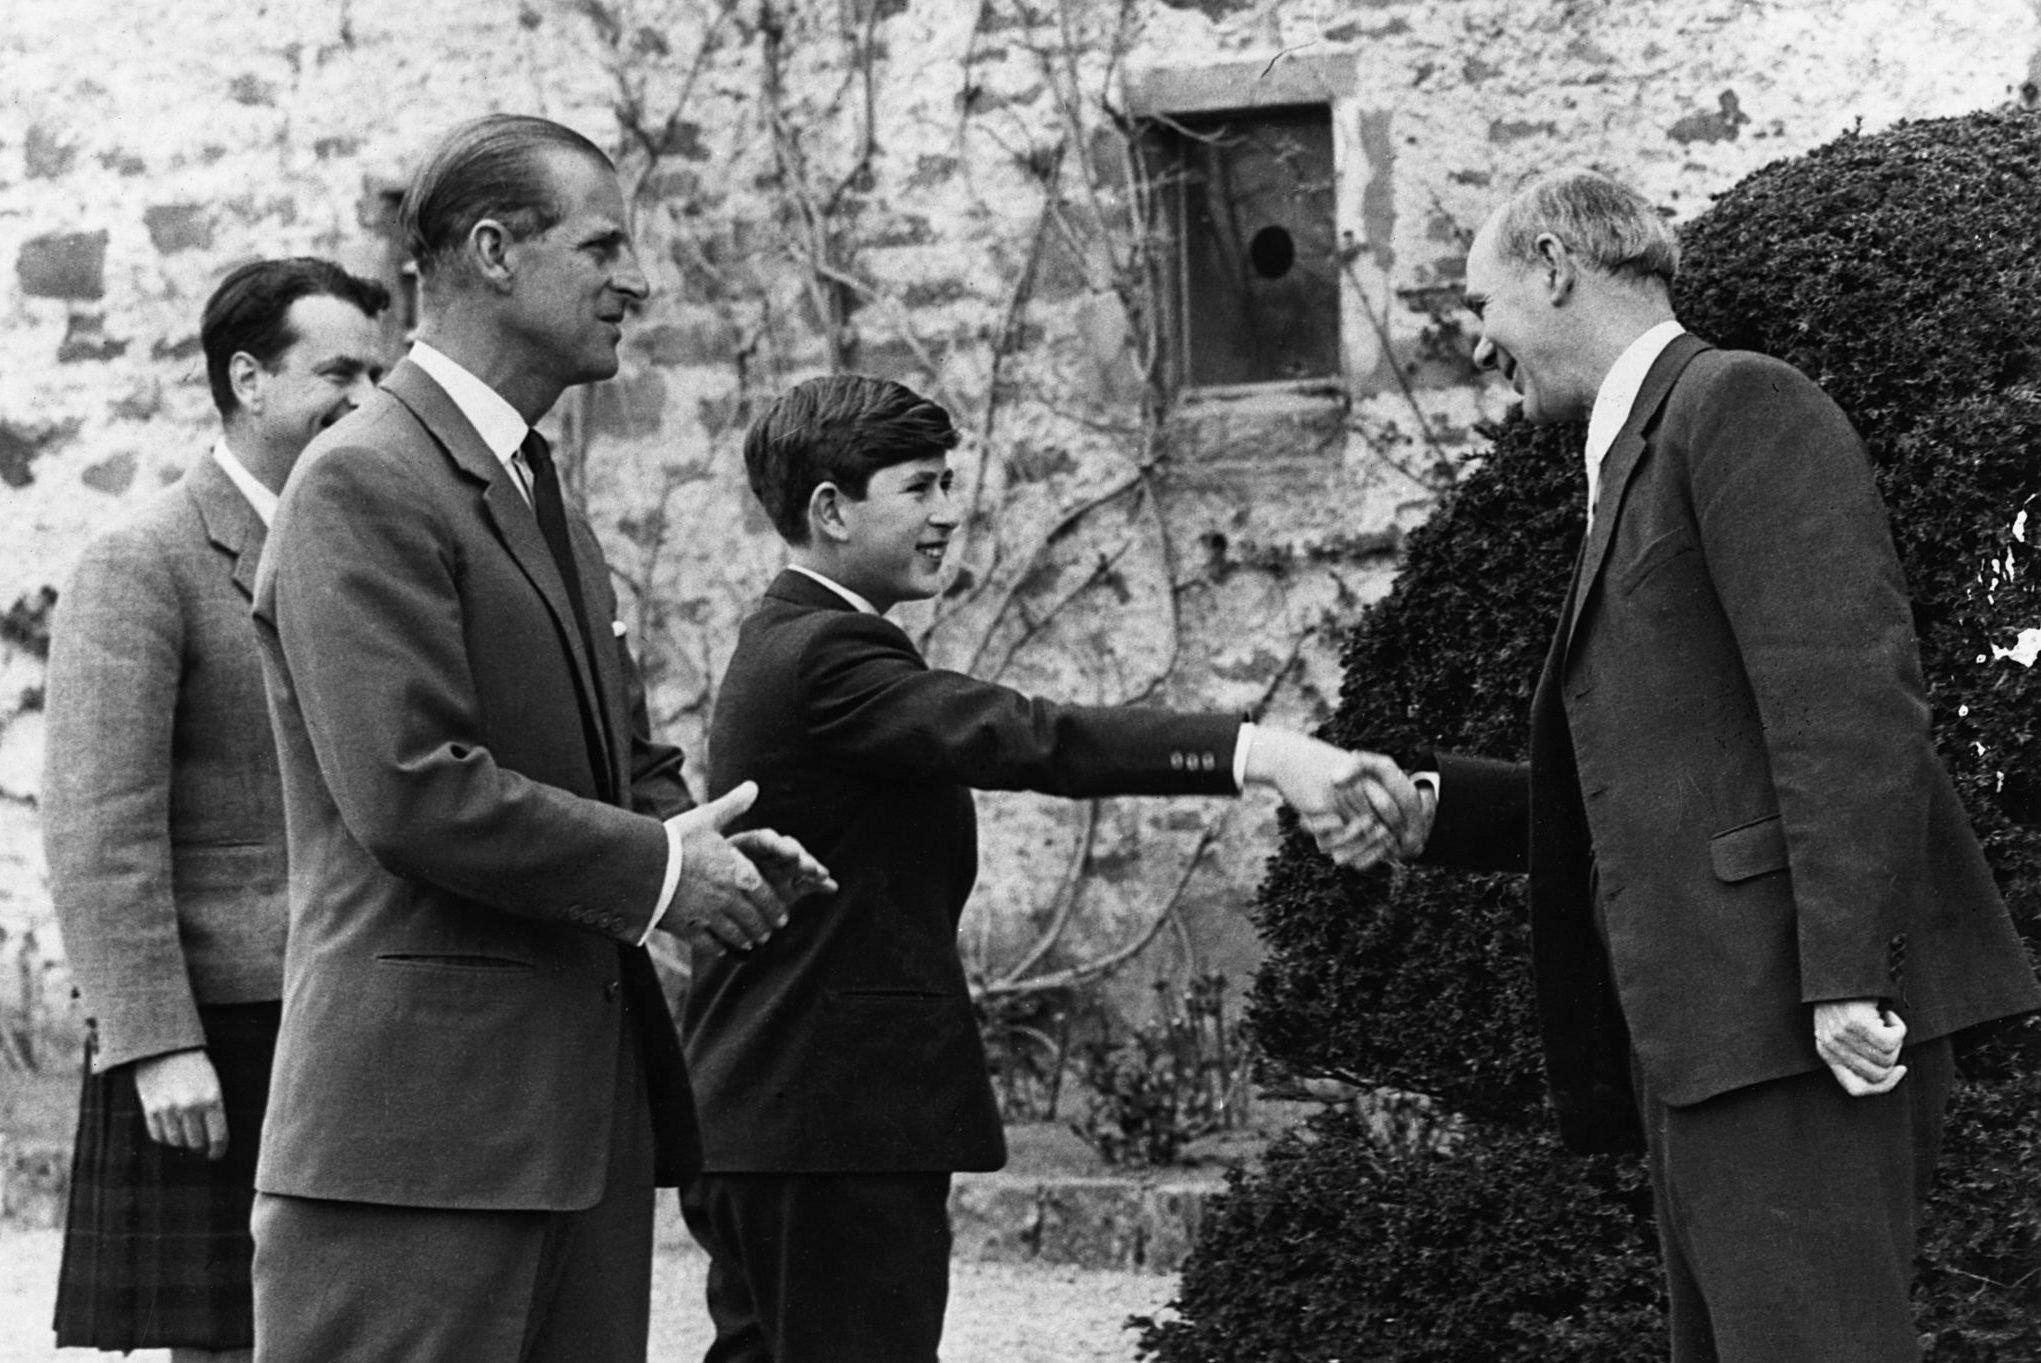 Prince Charles at Gordonstoun